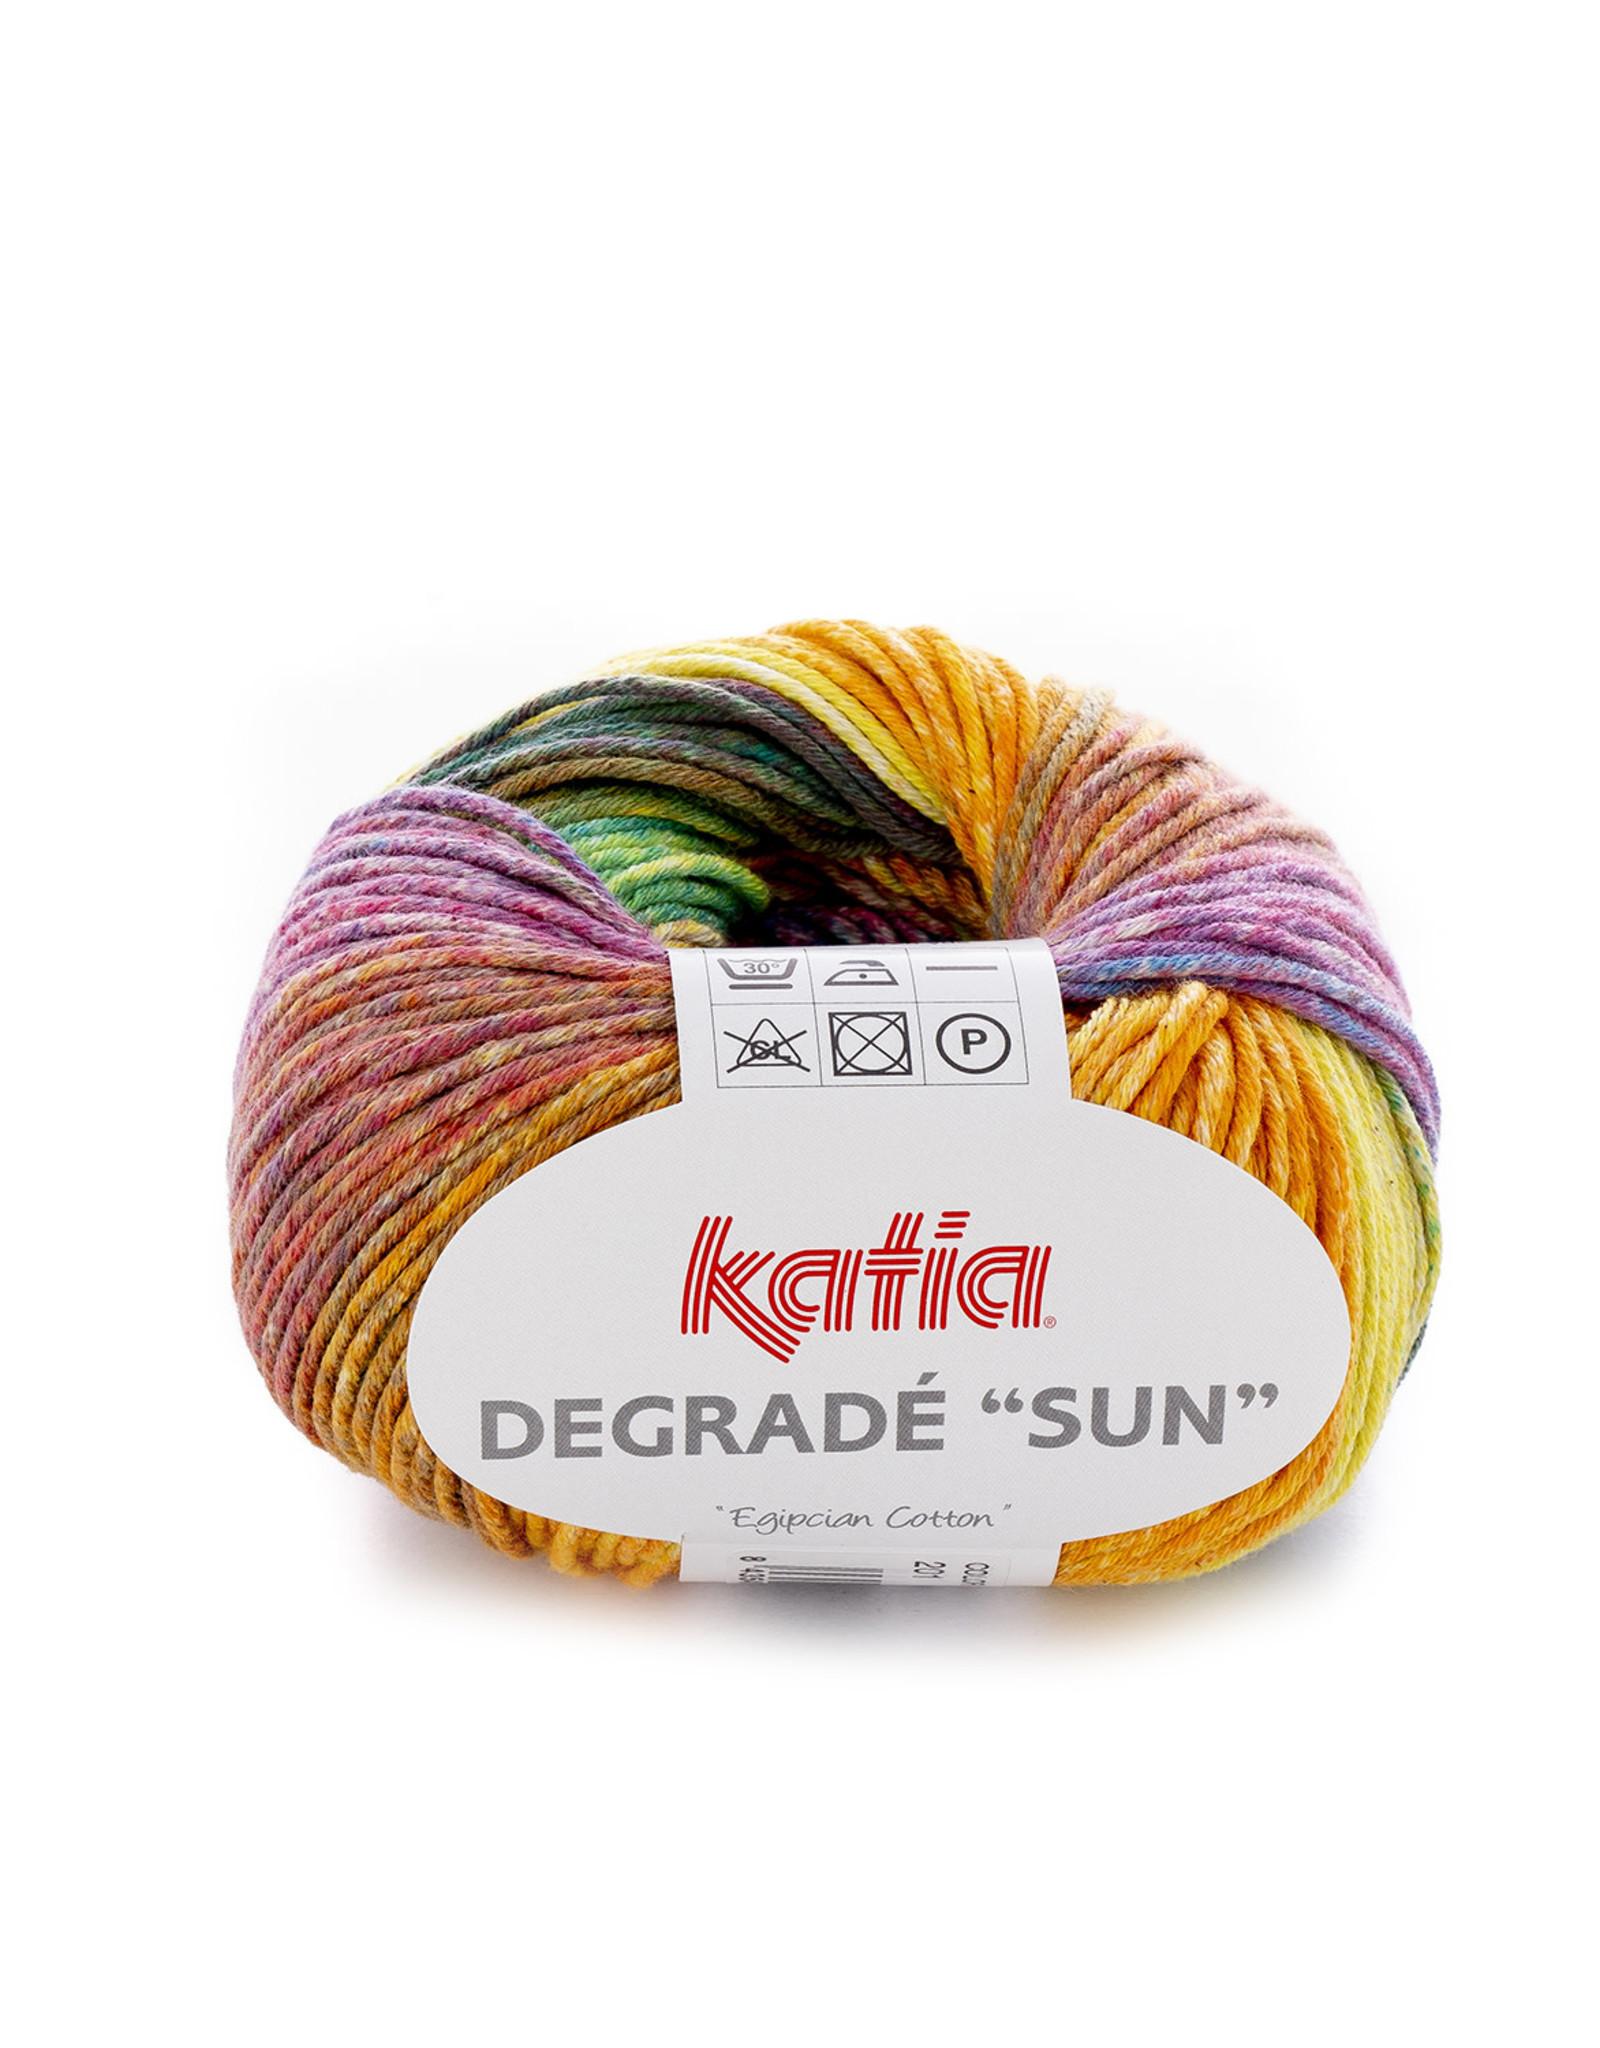 Katia Katia Degrade Sun 201 Groen-geel-lila